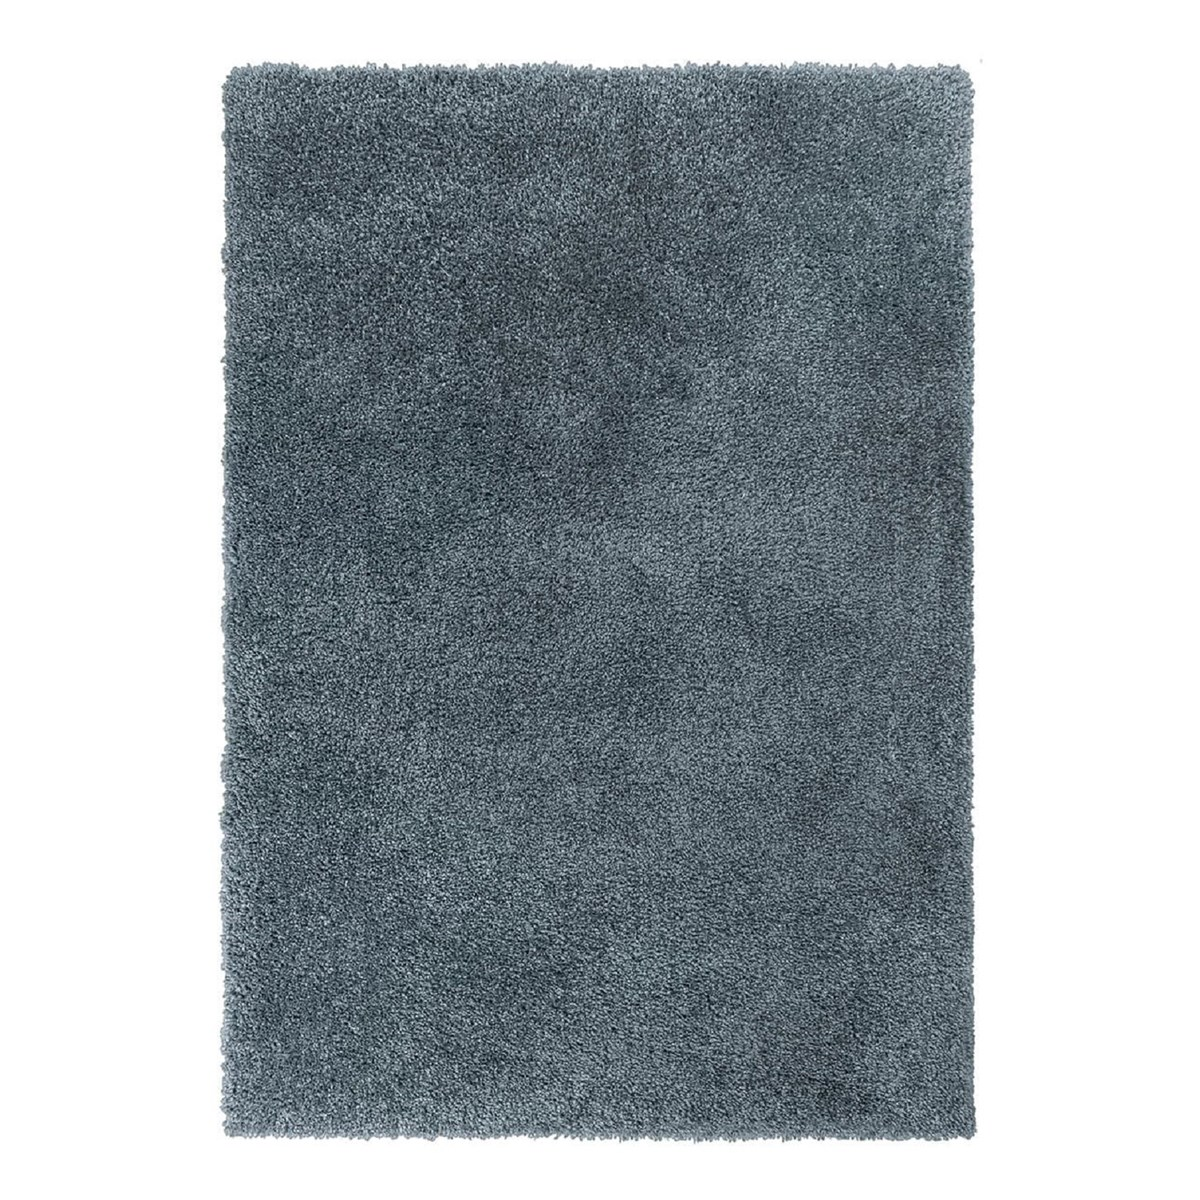 Tapis shaggy en Polyester Bleu 120x170 cm